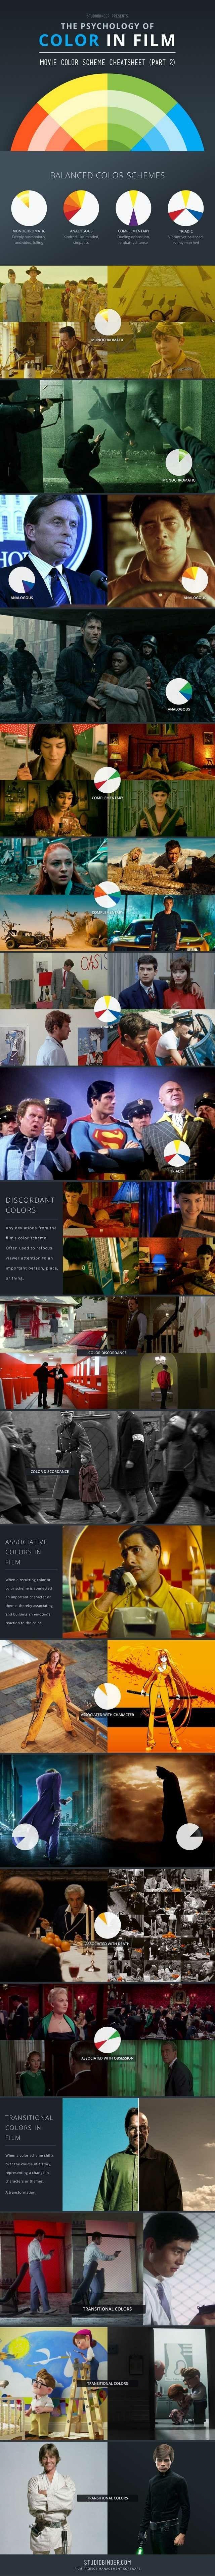 Movie Color Scheme, by StudioBinder